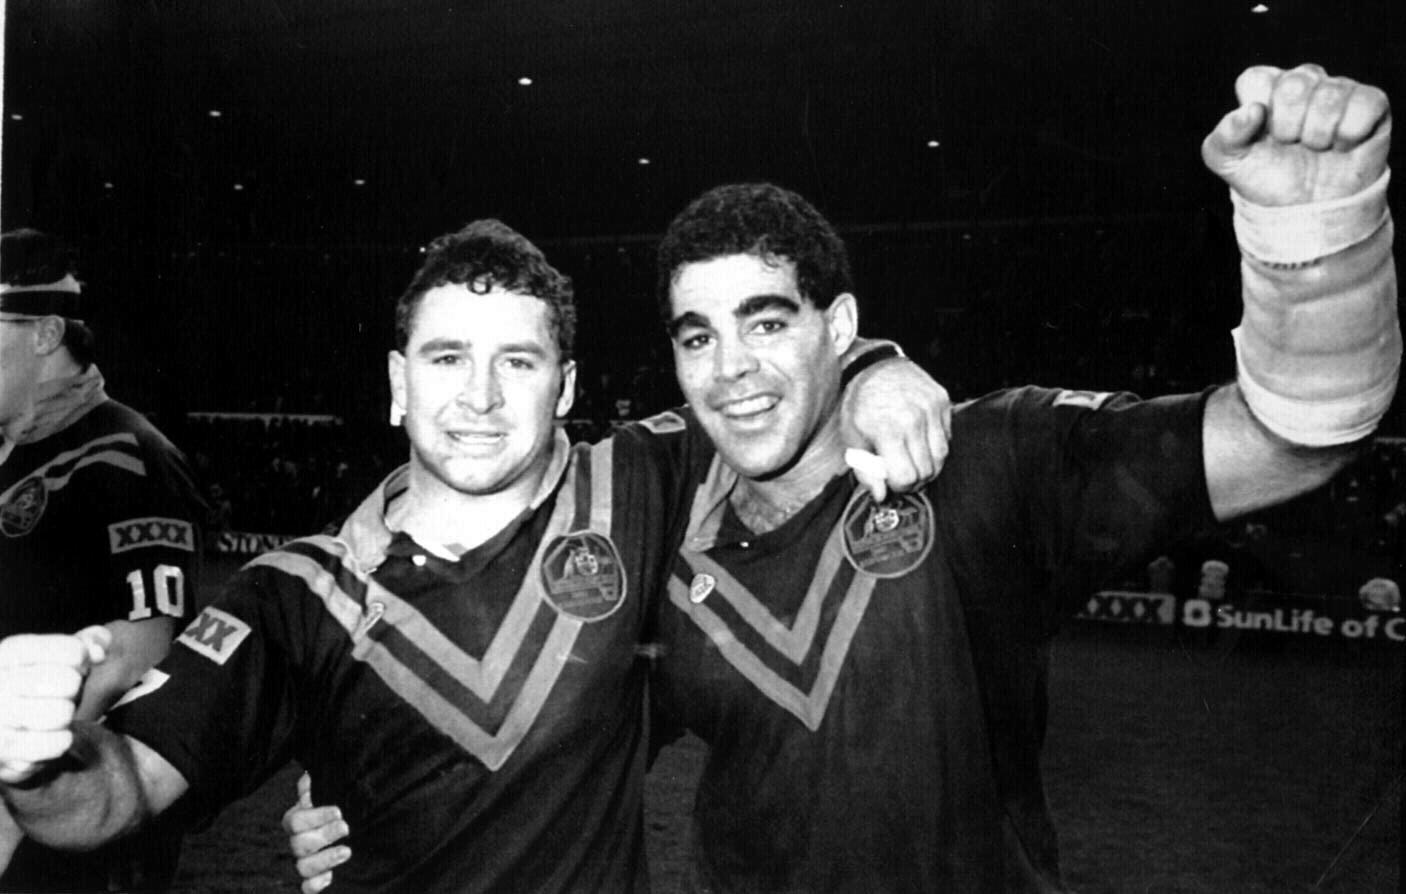 Ricky Stuart and Mal Meninga on the 1990 Kangaroos tour.